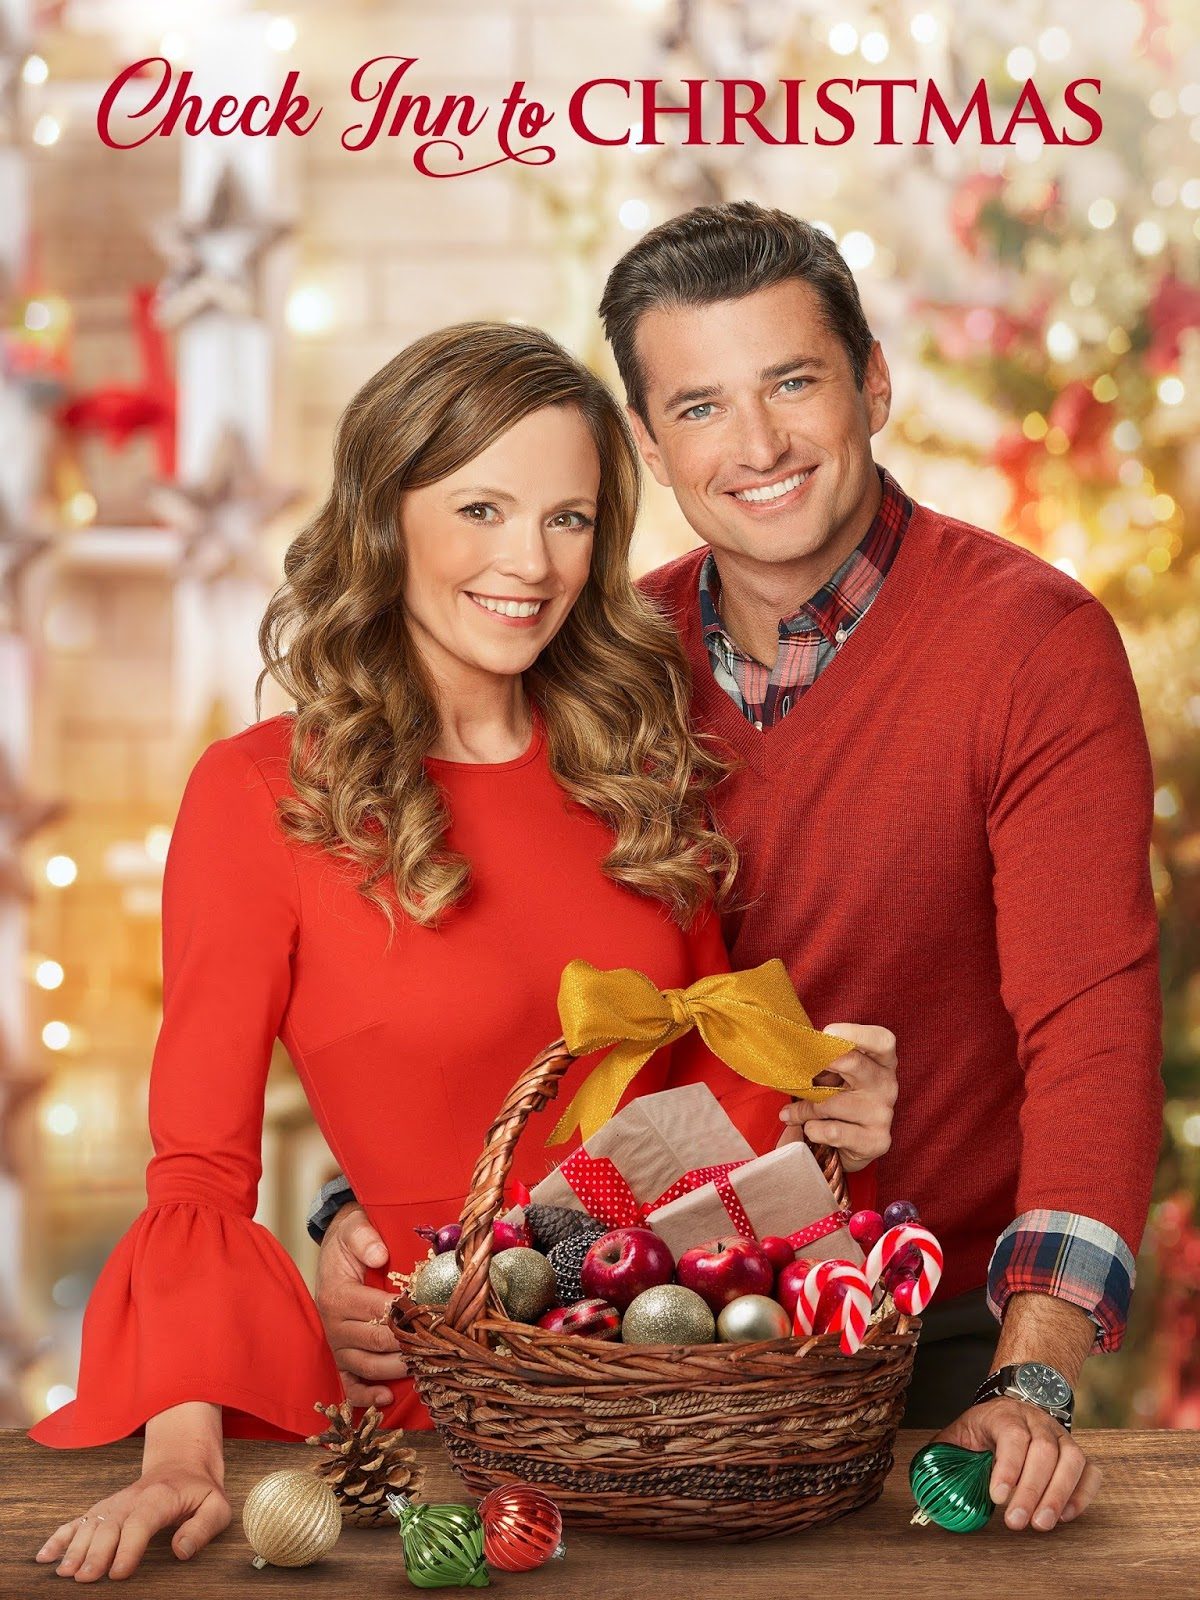 Top 10 Hallmark Christmas Movies Of 2019